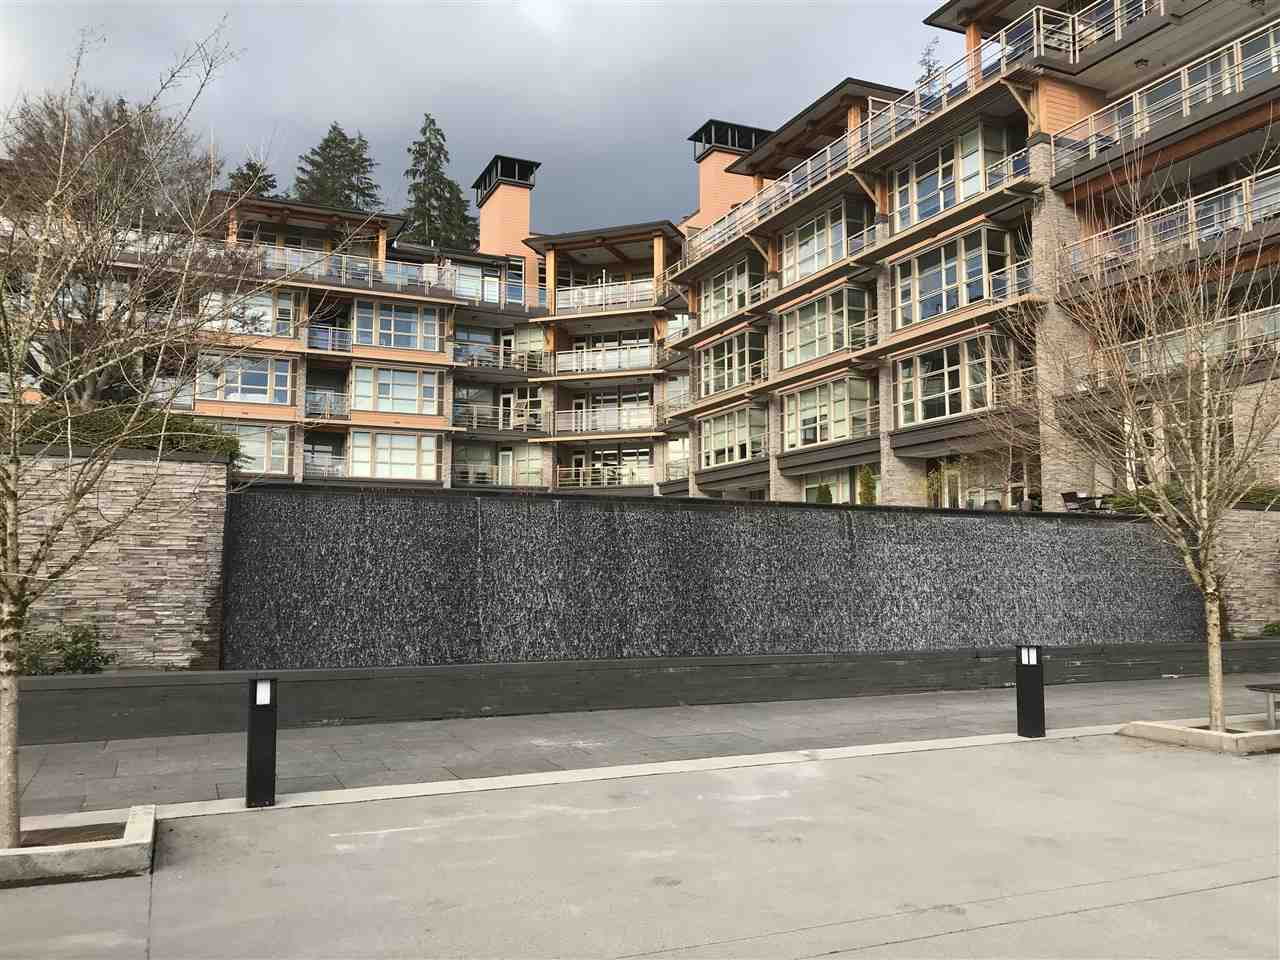 506 3606 ALDERCREST DRIVE, North Vancouver, BC, V7G 0A3 Photo 1